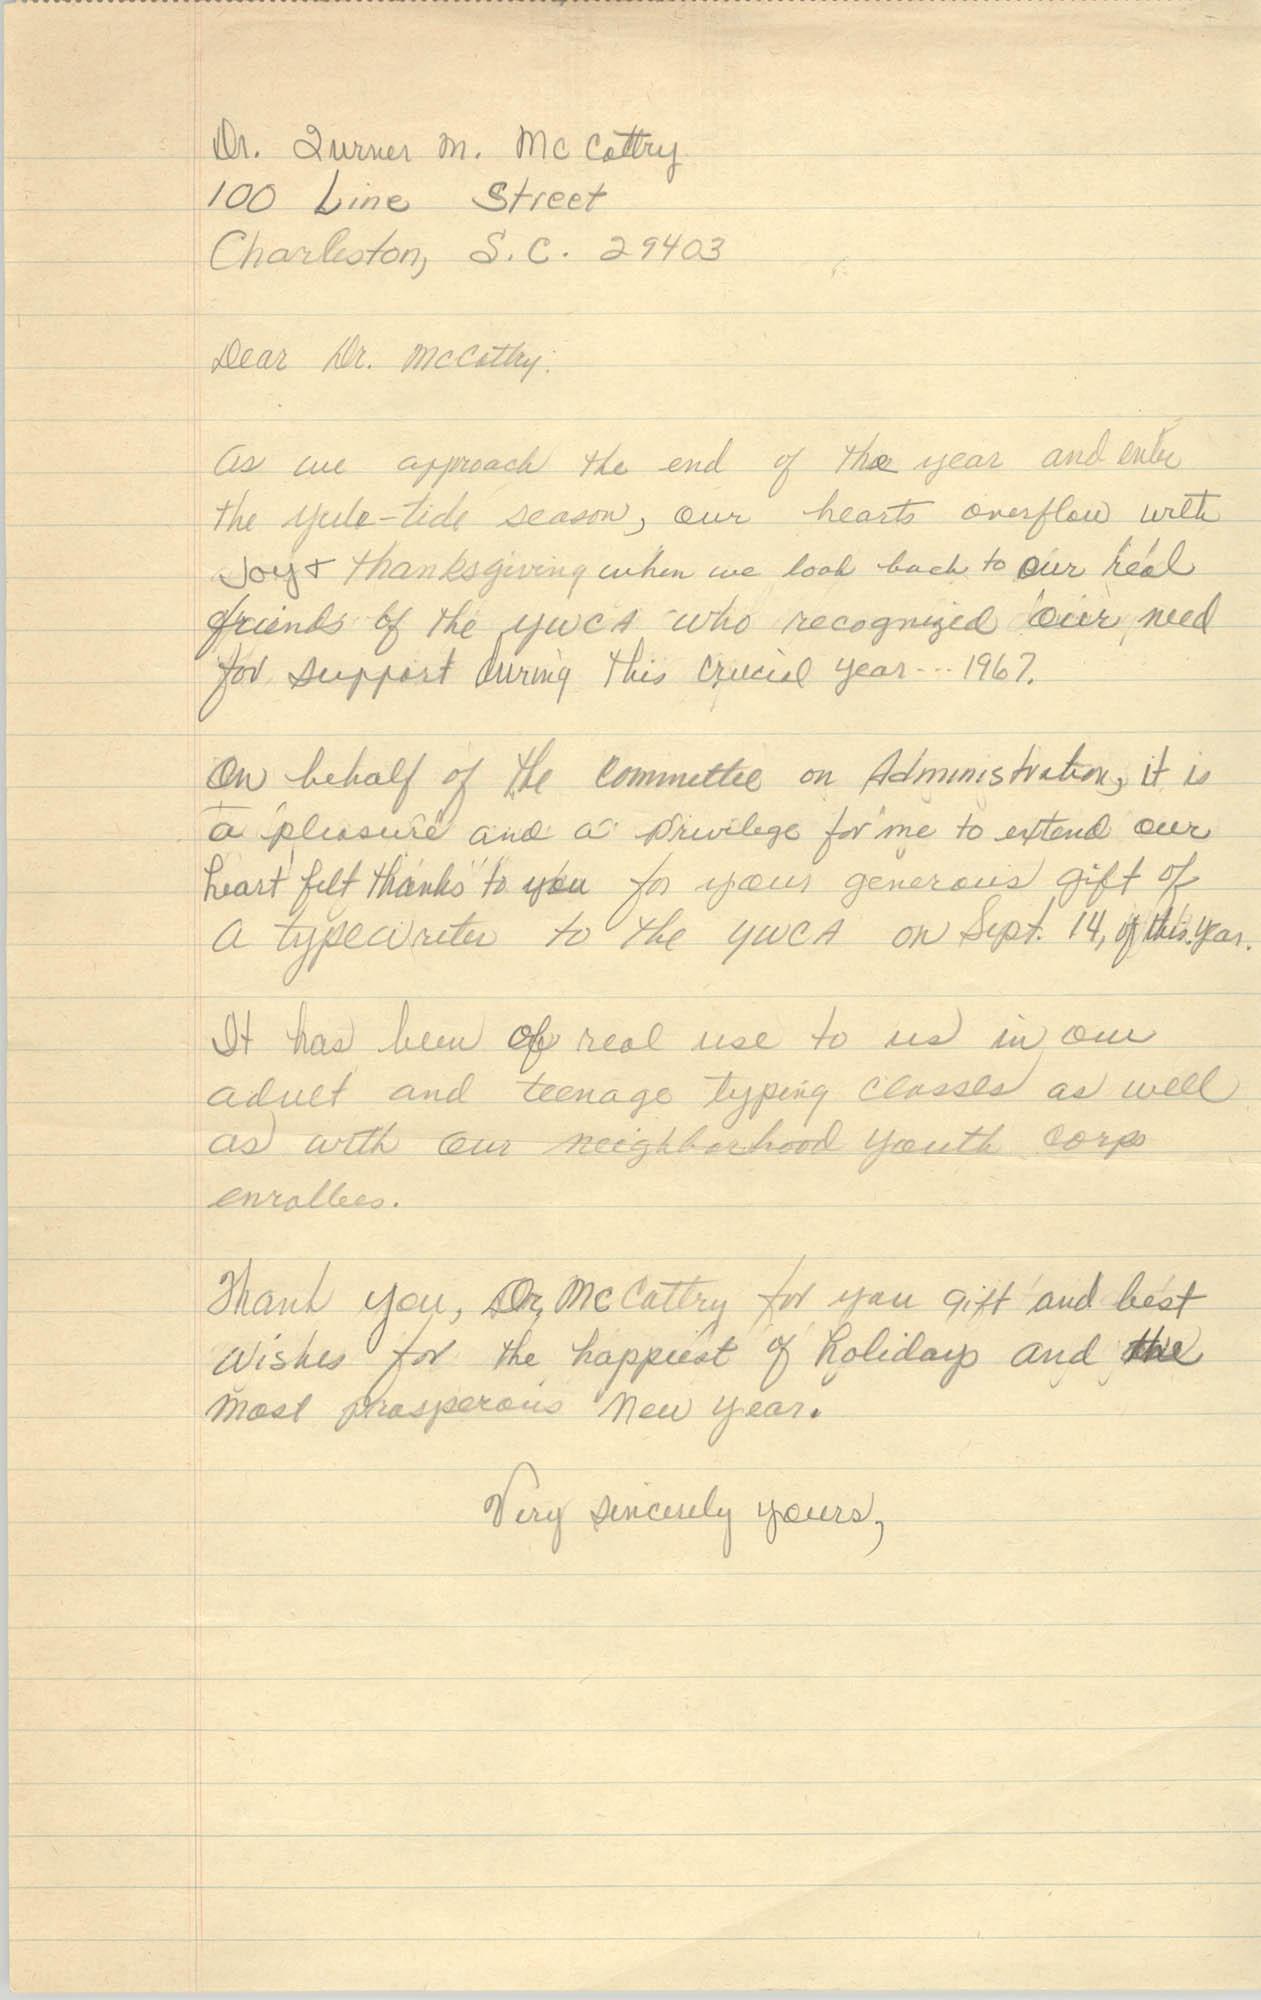 Letter to Turner M. McCottry, 1967